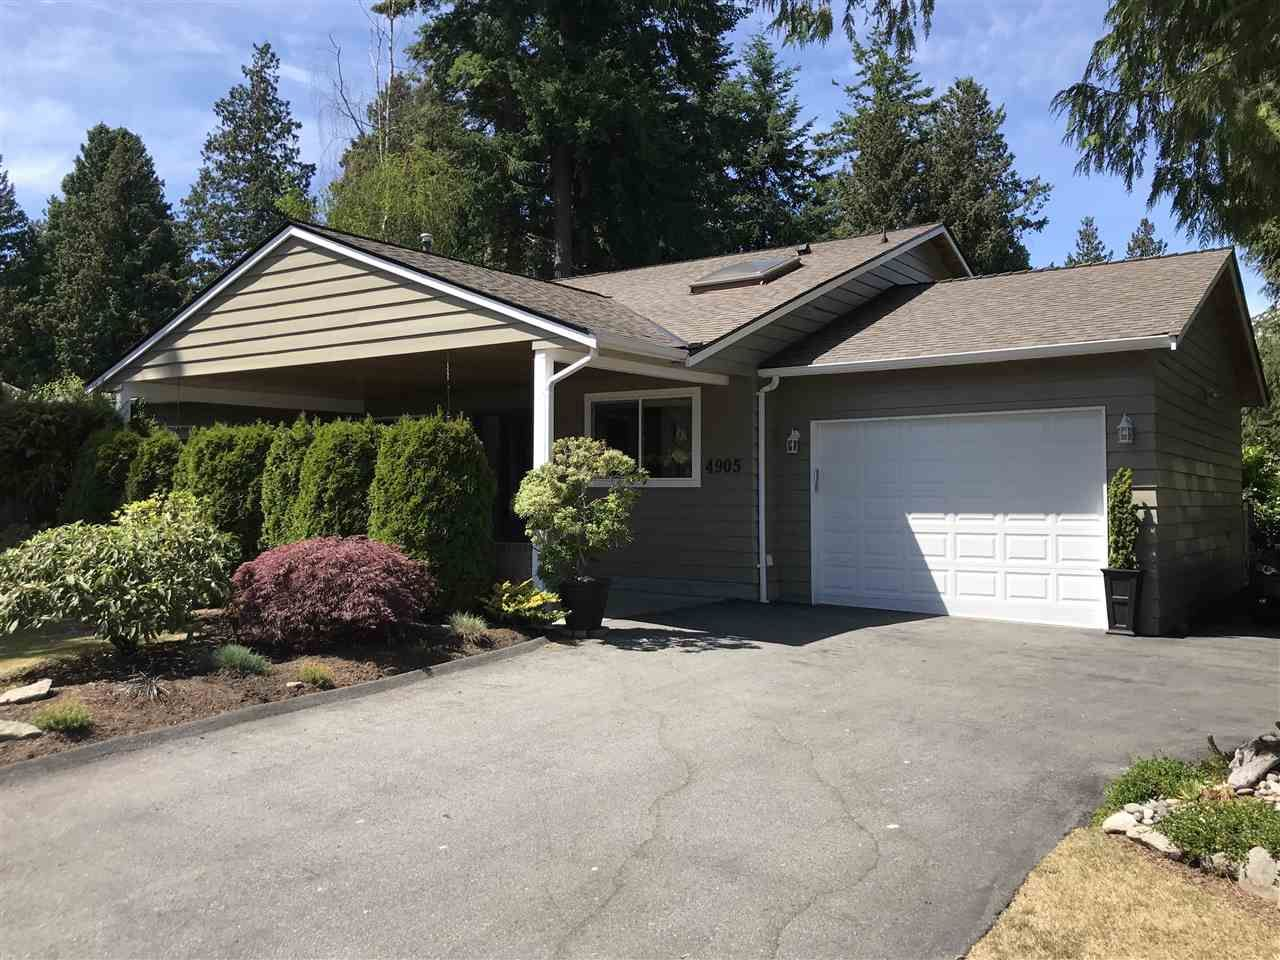 Main Photo: 4905 6 Avenue in Delta: Tsawwassen Central House for sale (Tsawwassen)  : MLS®# R2410076